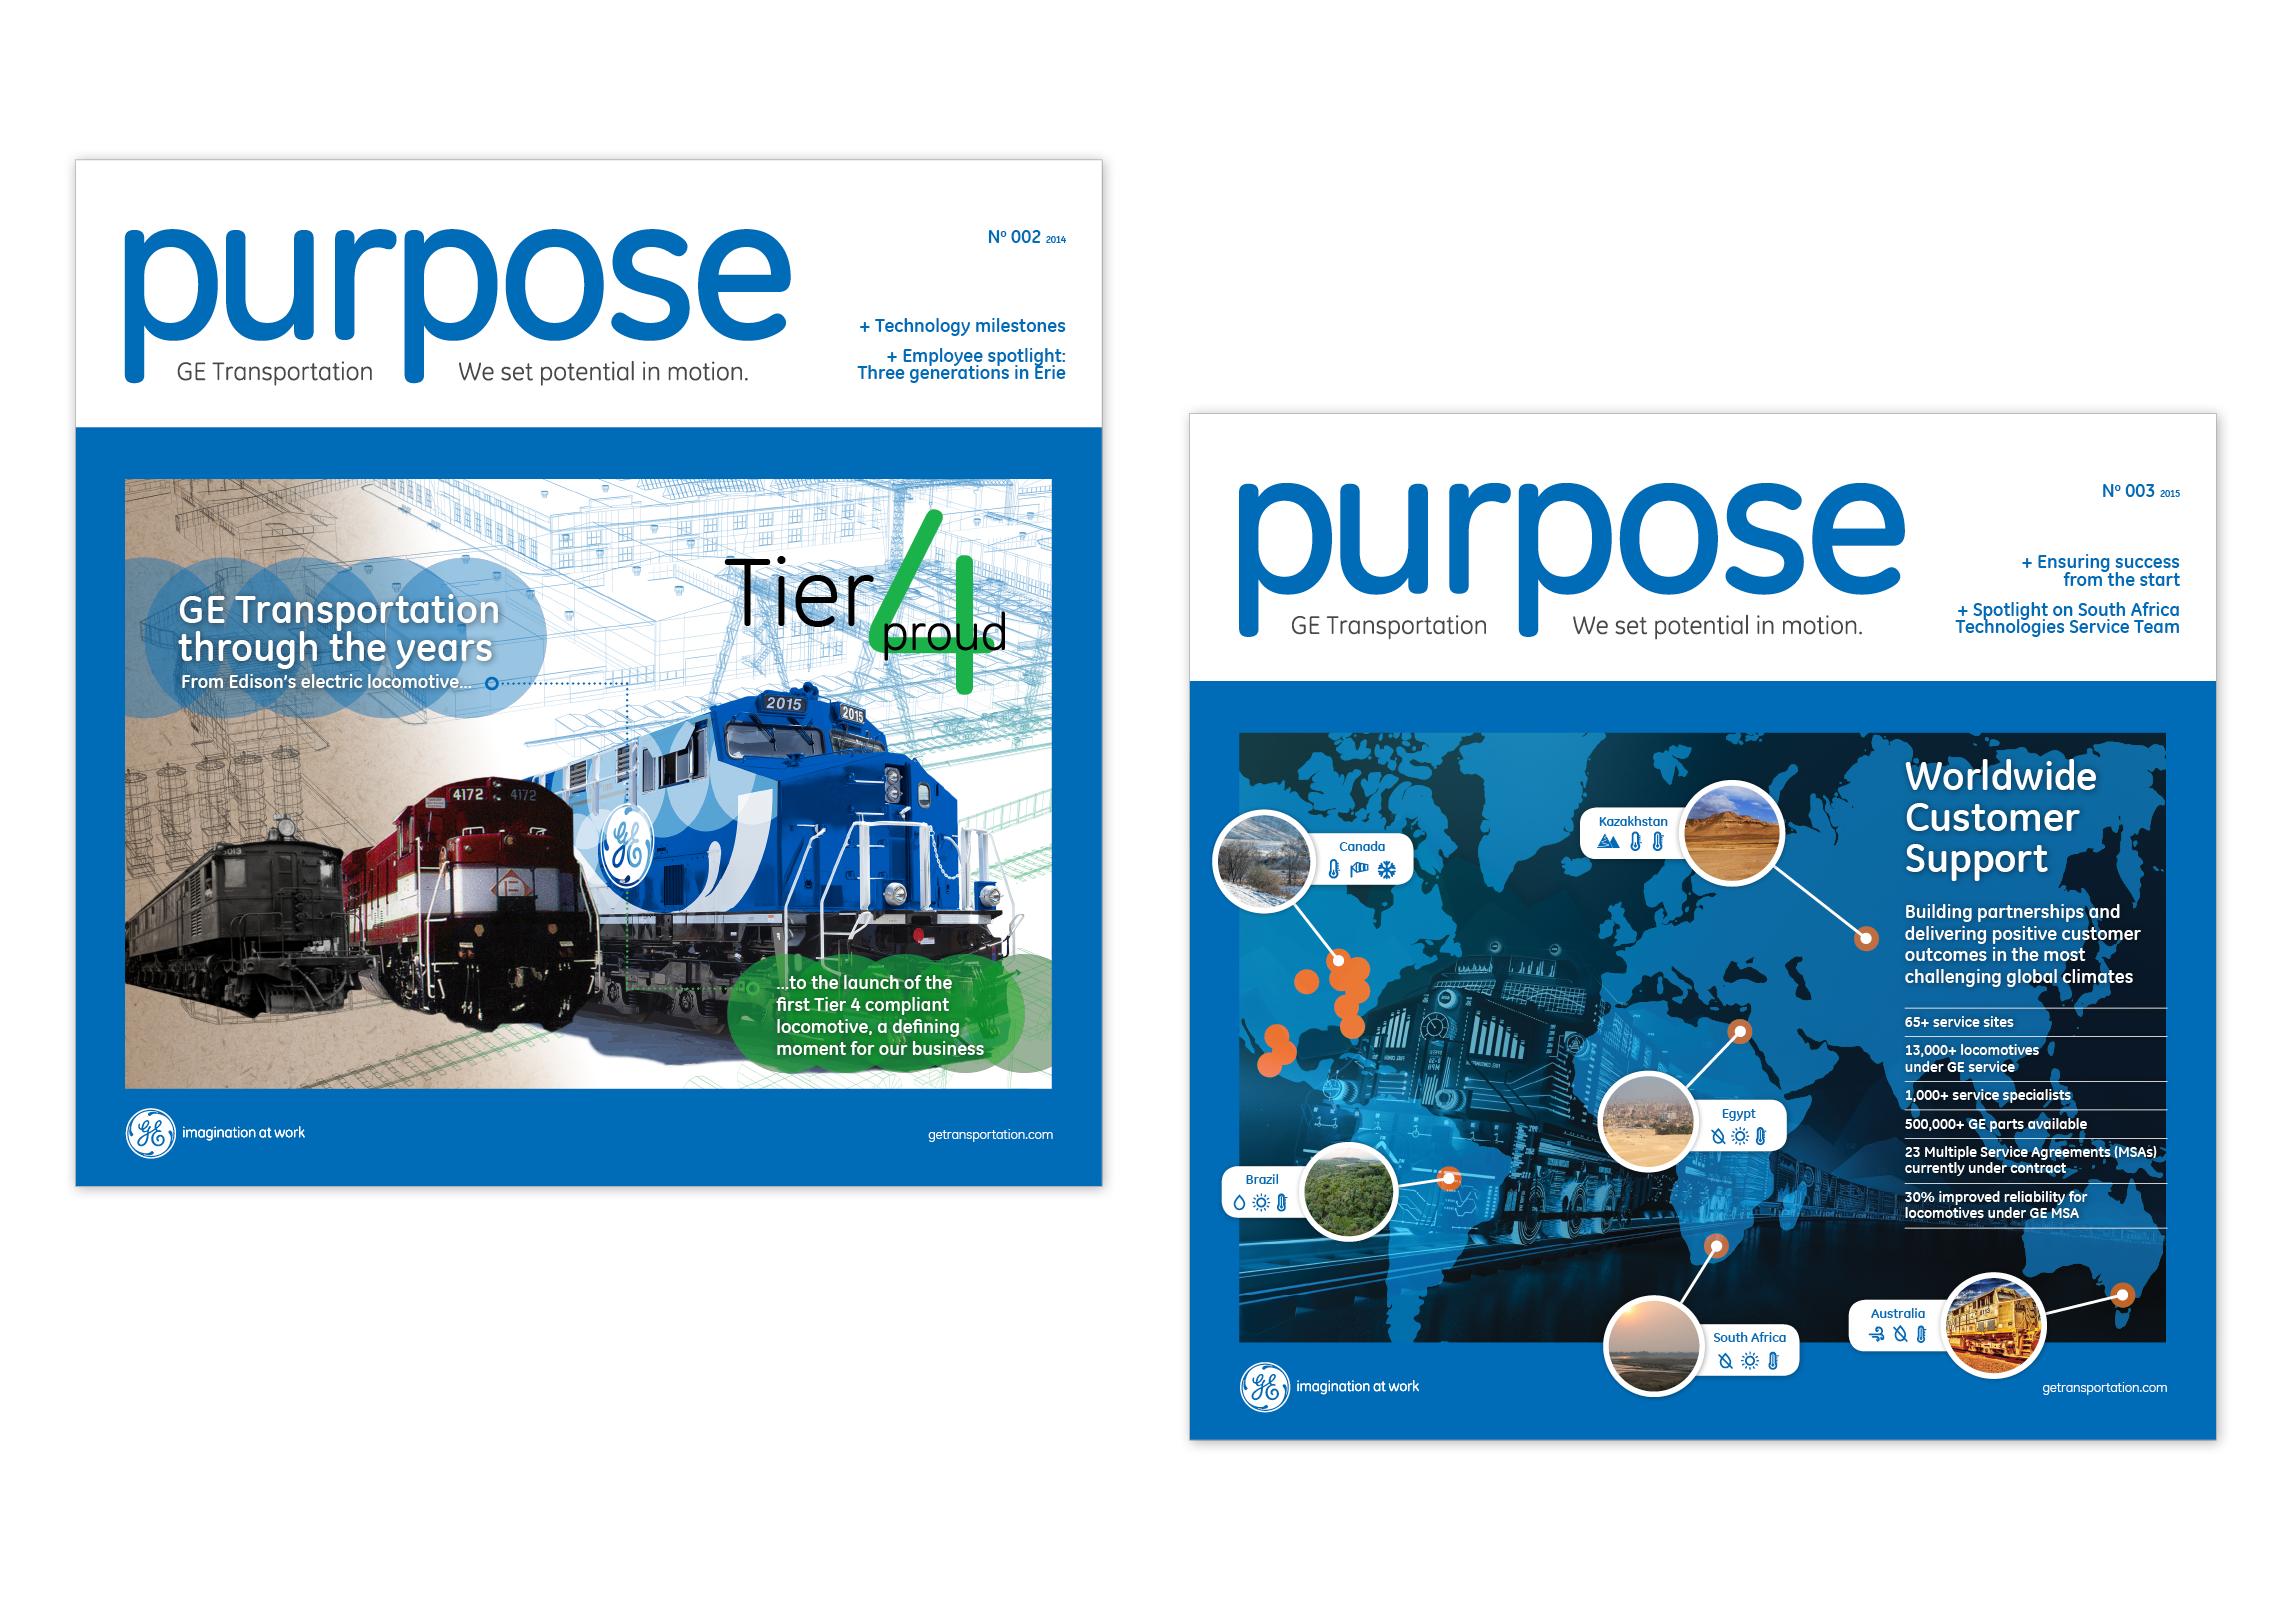 GE's purpose newsletter